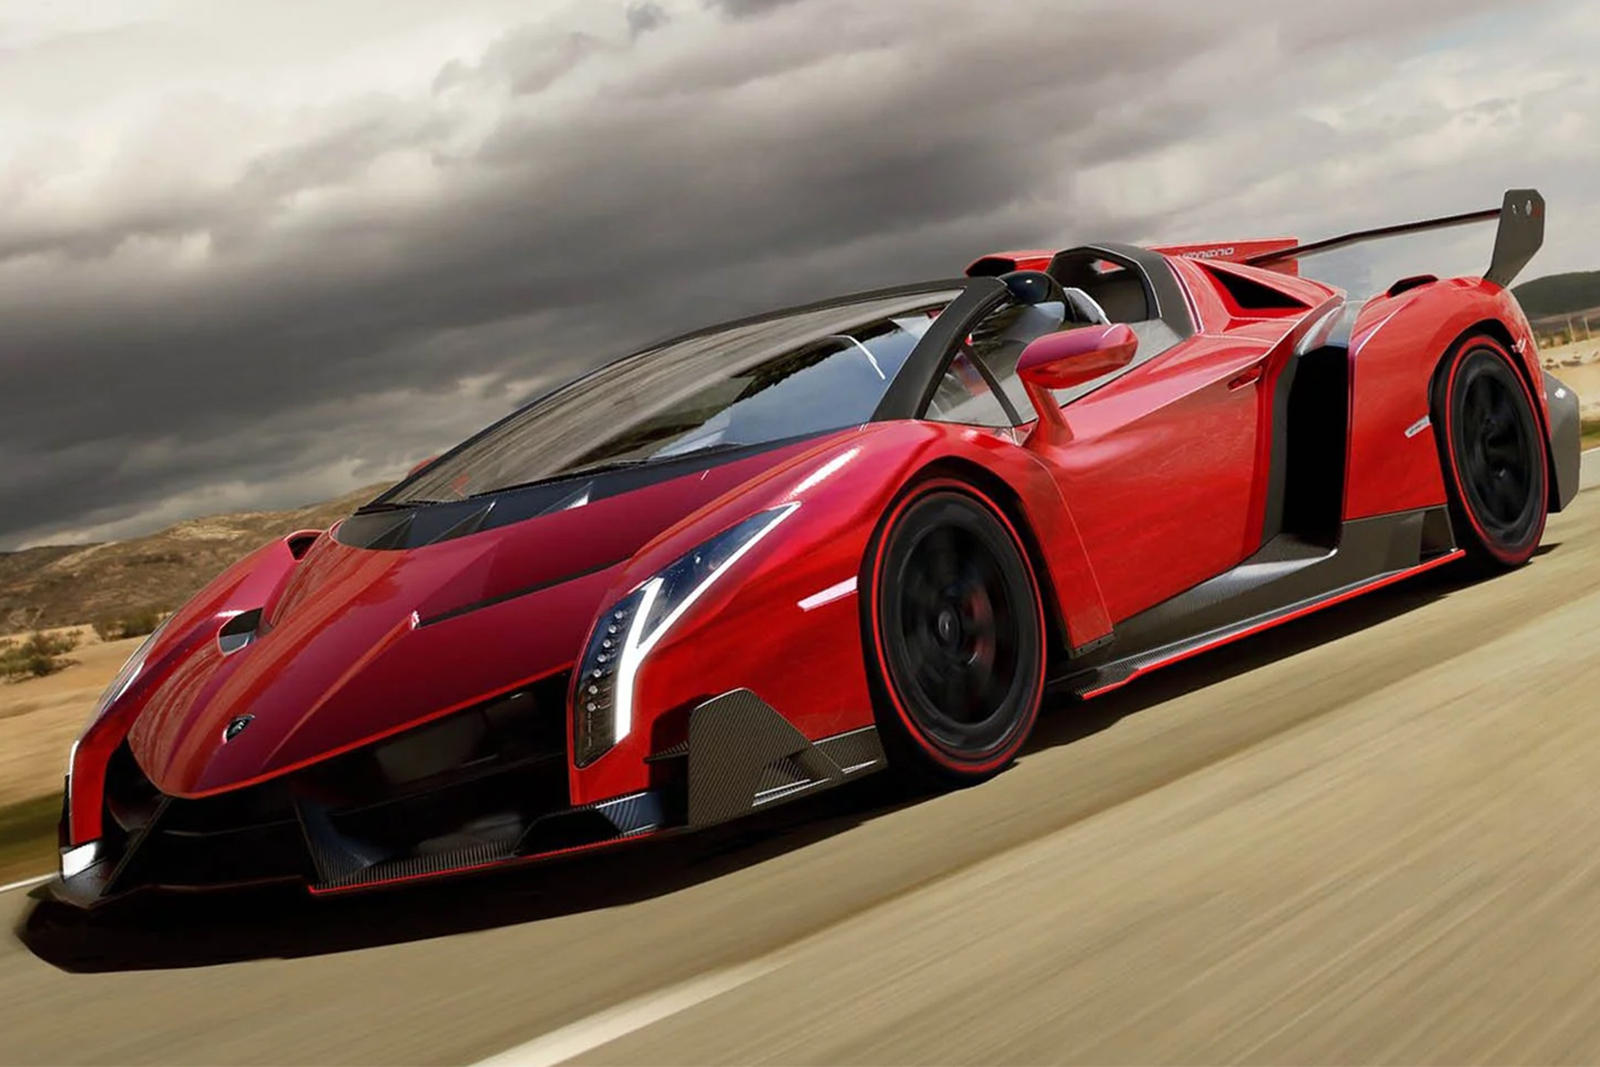 Lamborghini Considers New Hypercar To Fight The Aston Martin